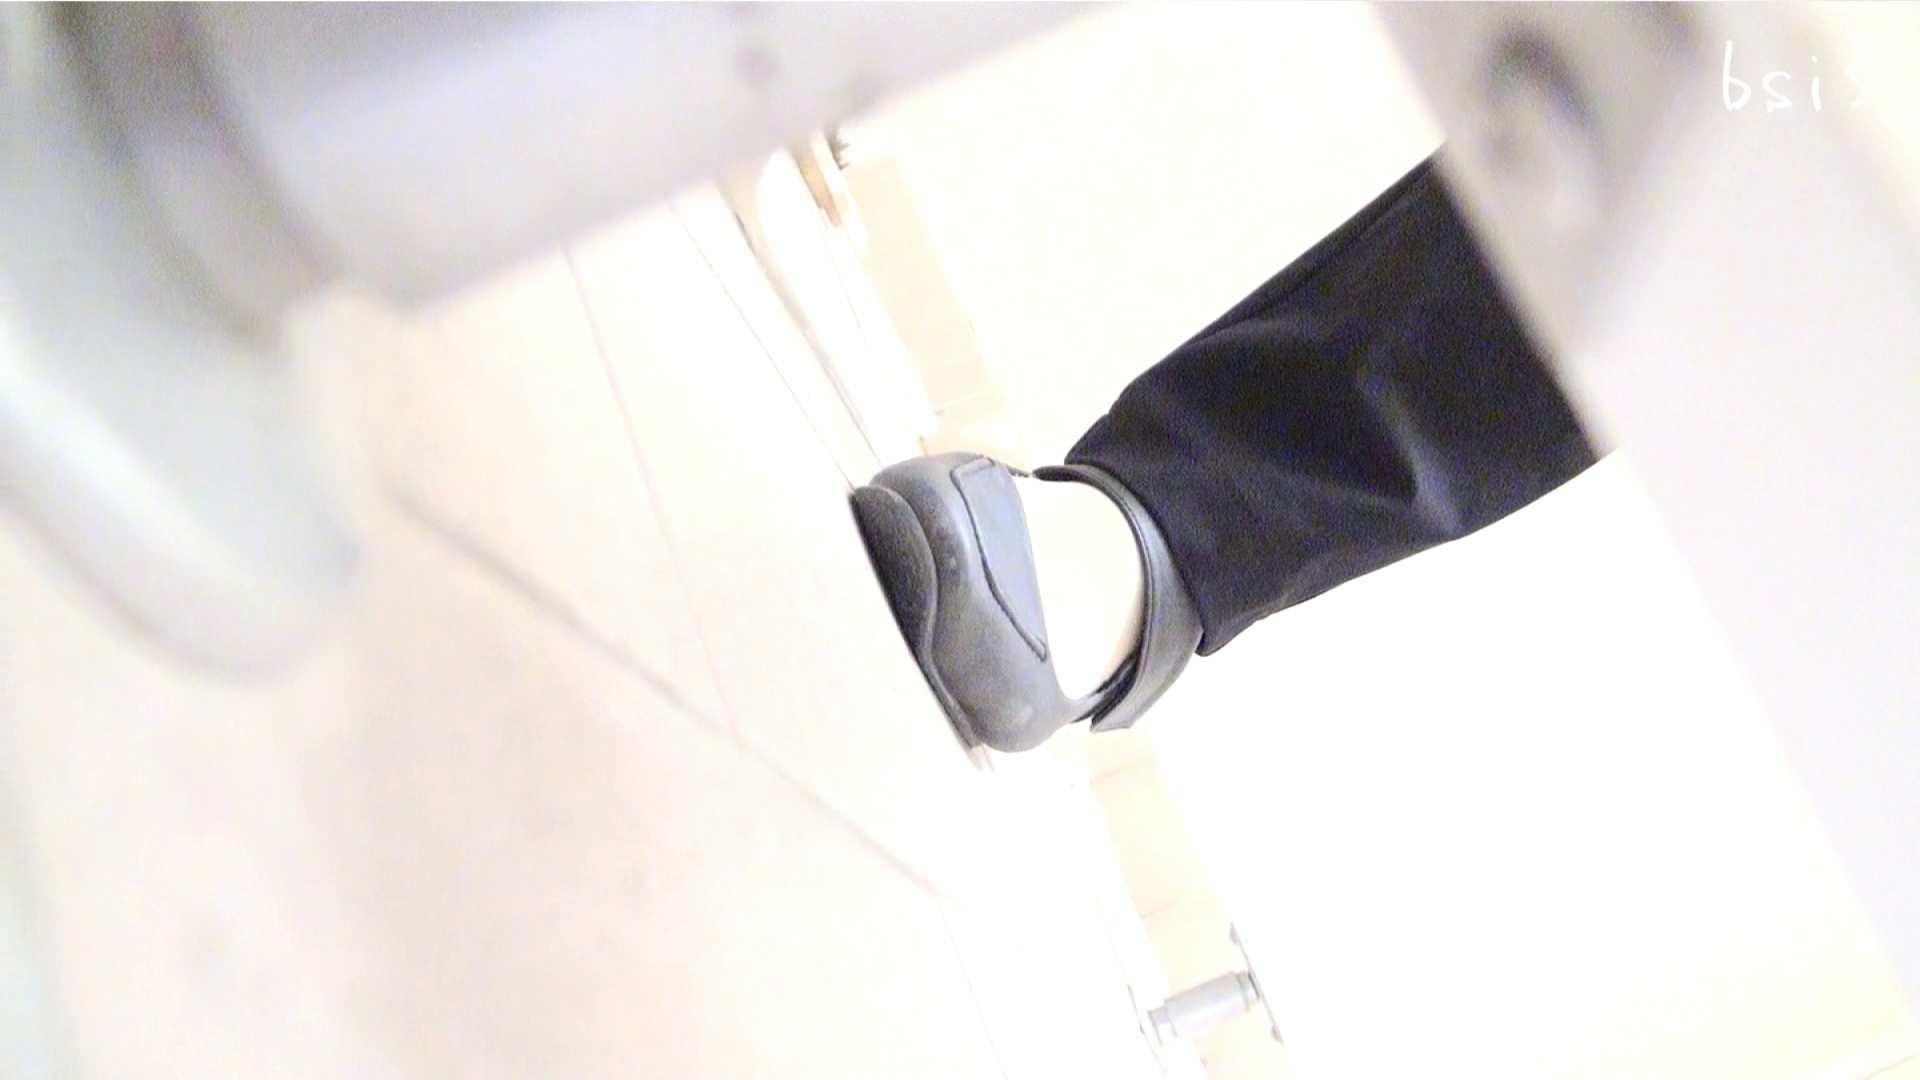 無修正エロ動画:至高下半身盗撮-PREMIUM-【院内病棟編 】VOL3:怪盗ジョーカー